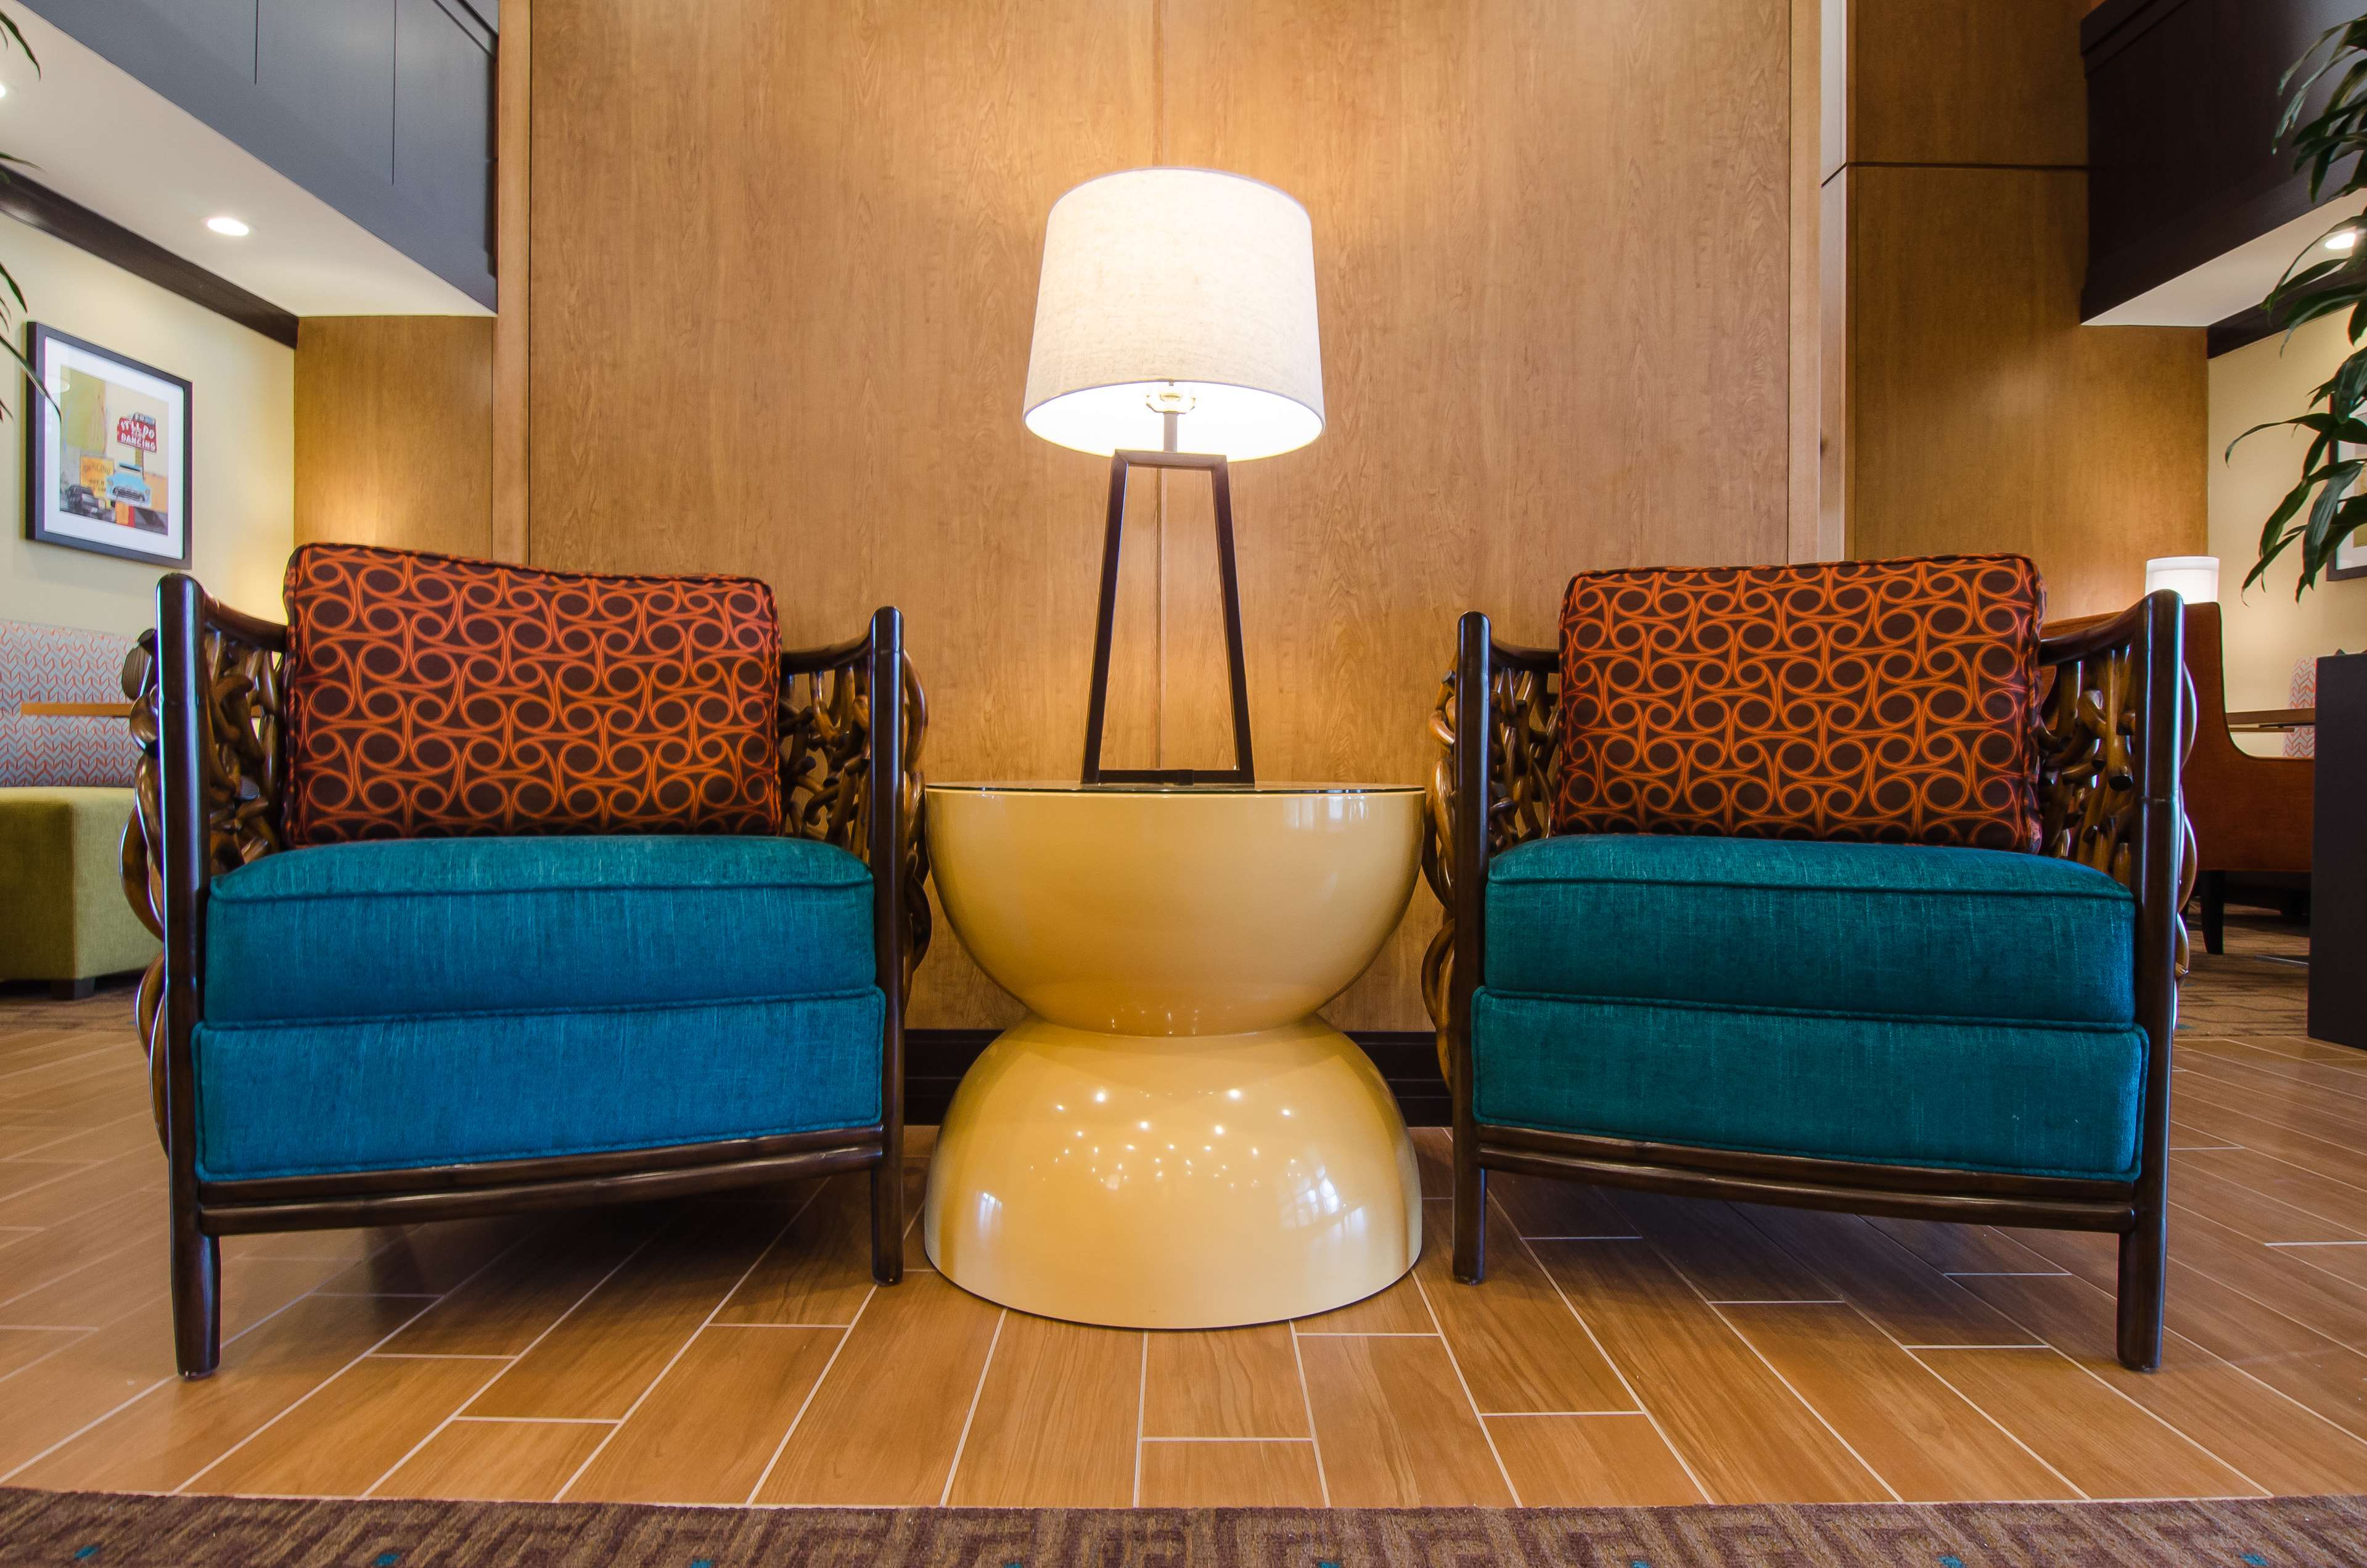 Hampton Inn & Suites Houston North IAH image 2